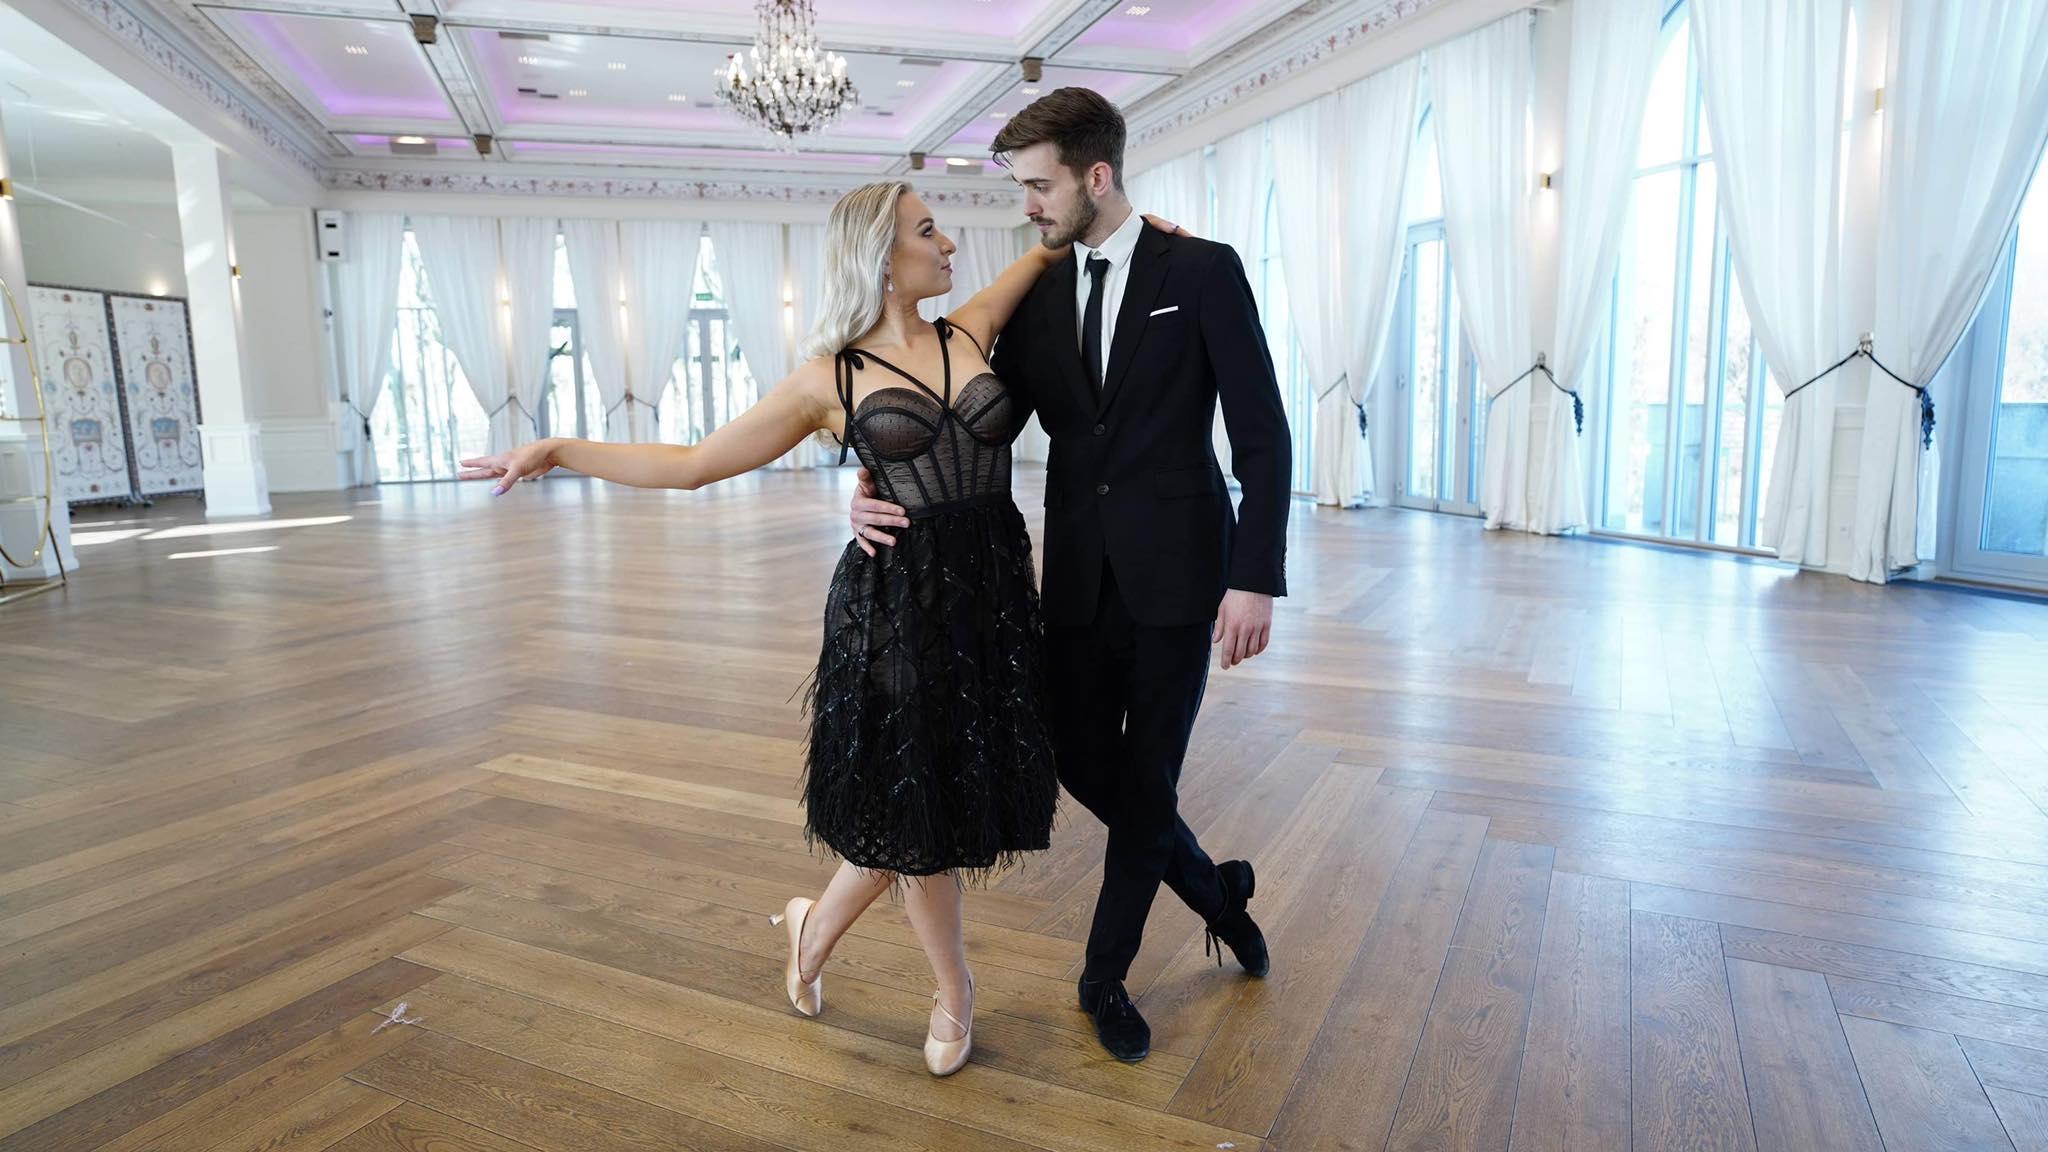 NEW! L.O.V.E. - Nat King Cole - Pierwszy Taniec   Wedding Dance Choreography